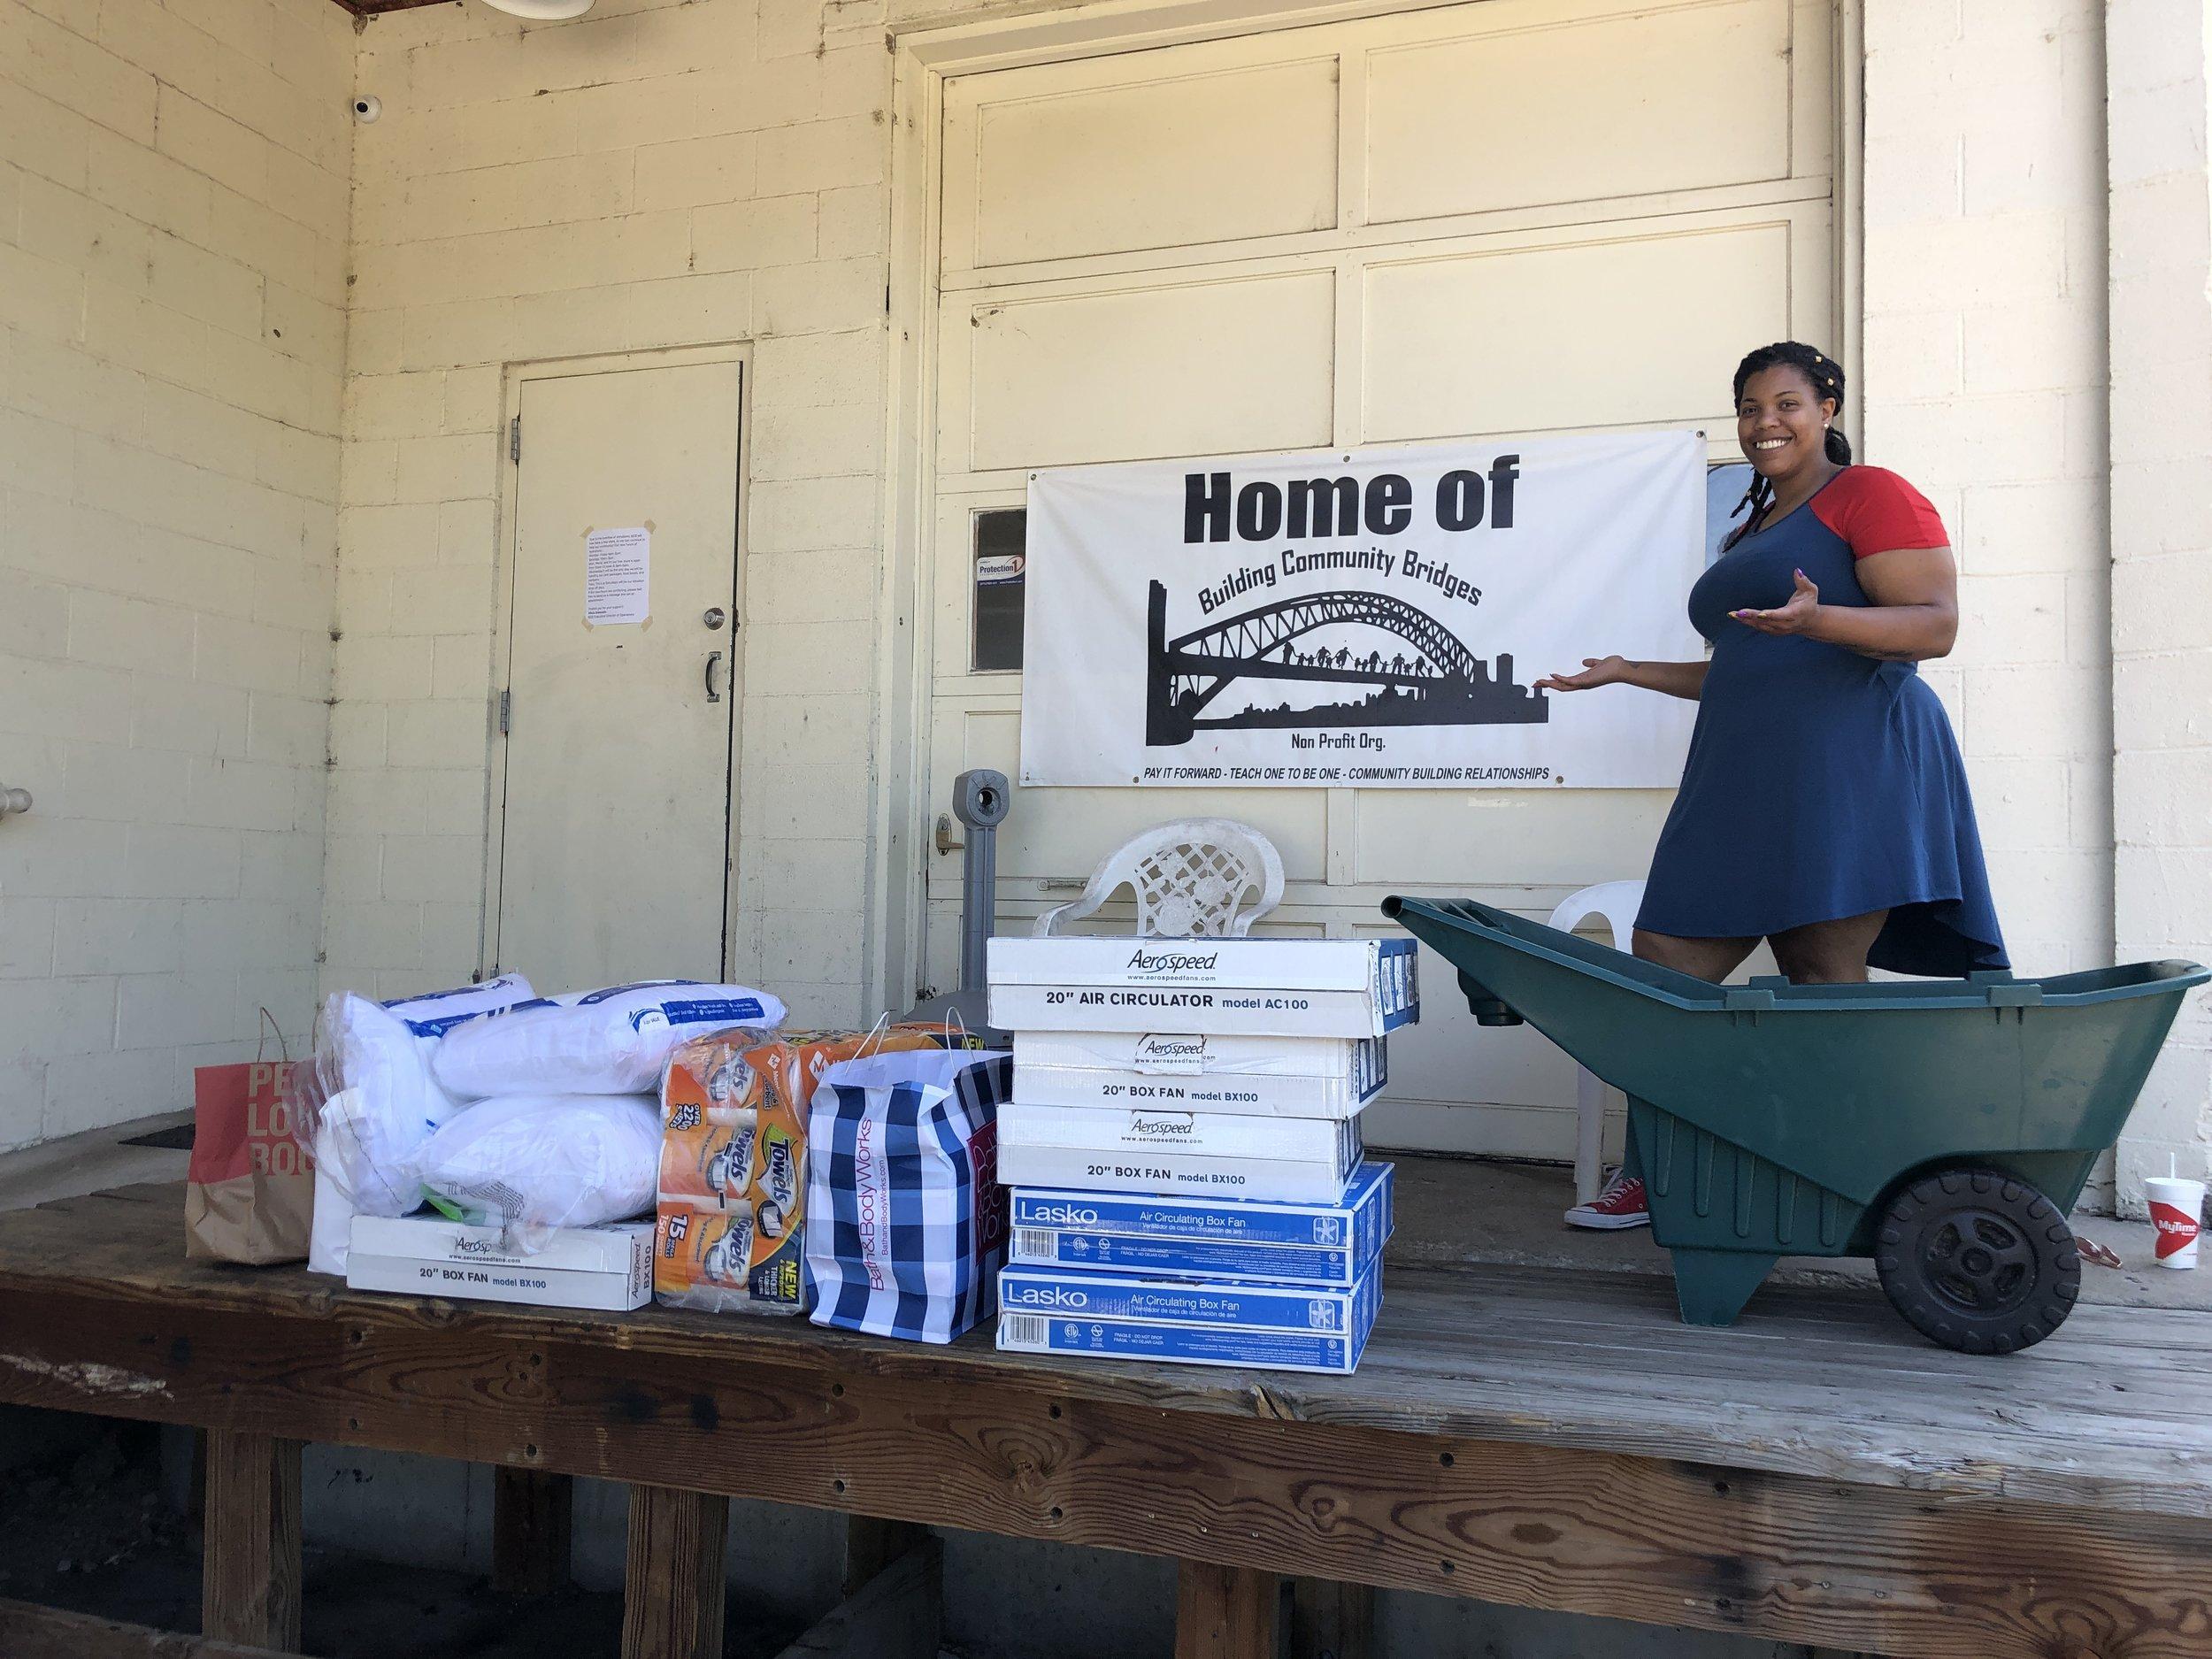 tornado-volunteers-capitol ave-jefferson-city-mo-jeff-city-building-community-bridges